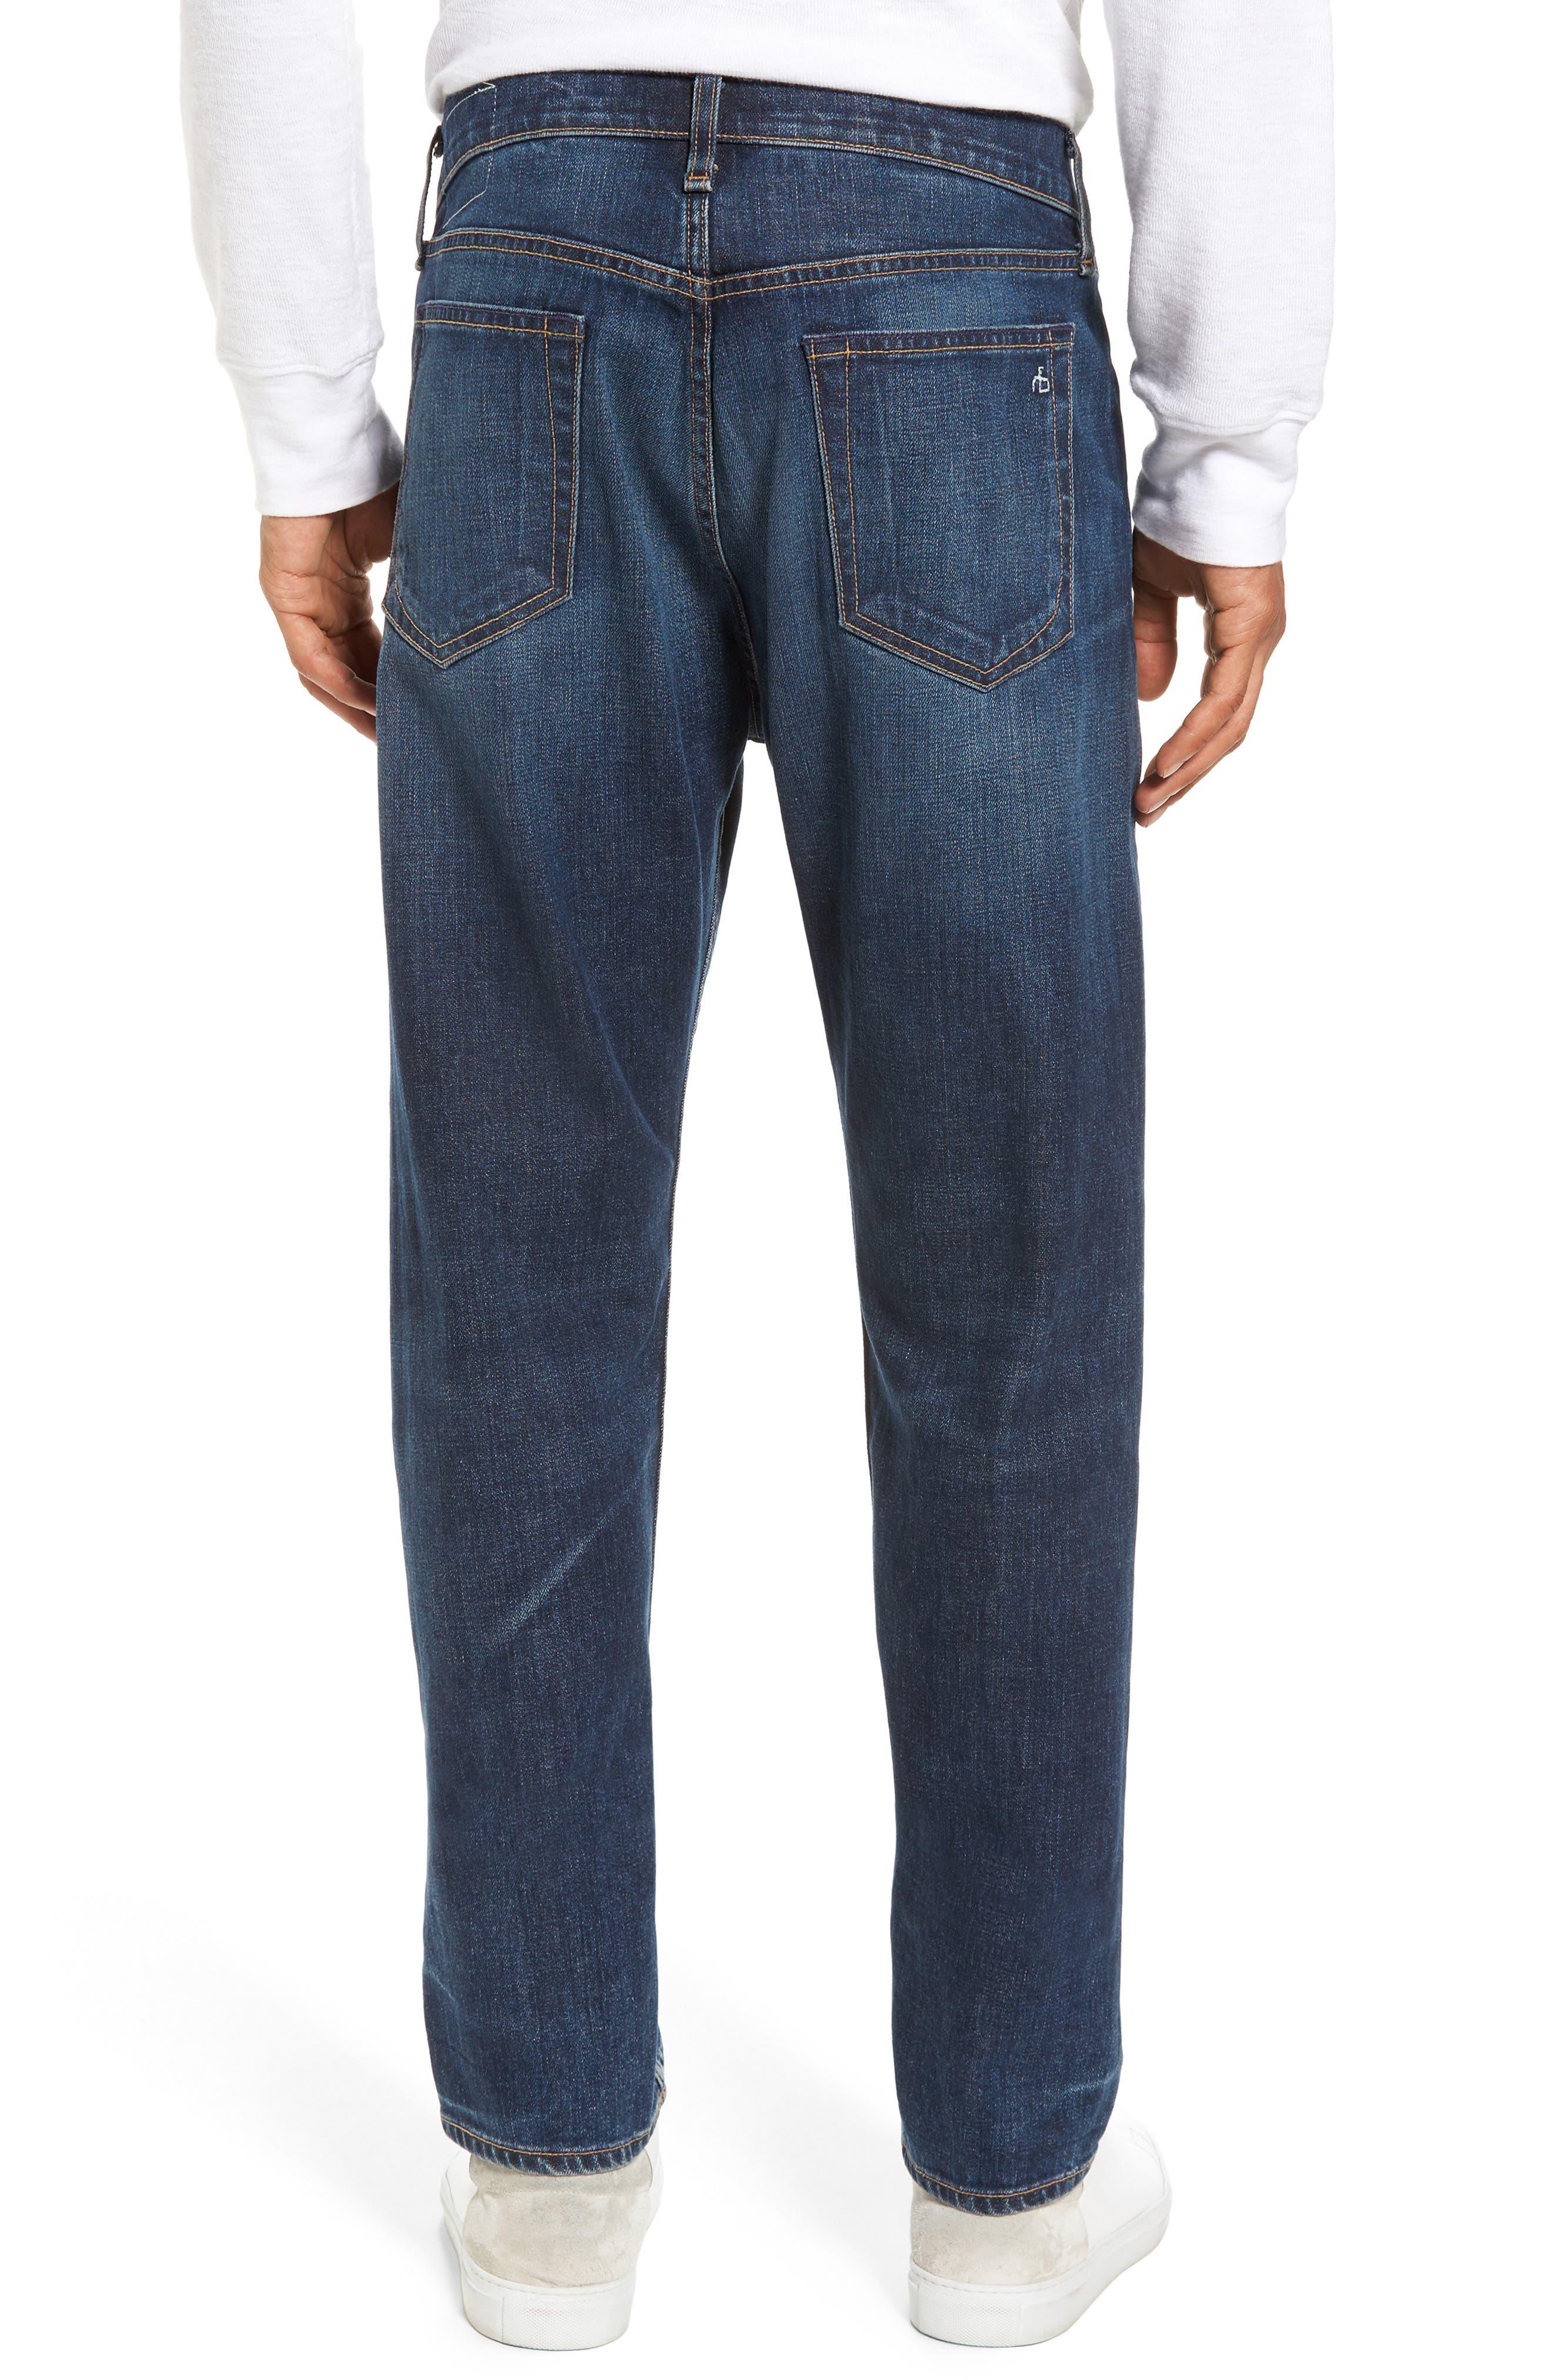 Fit 3 Slim Straight Leg Jeans,                             Alternate thumbnail 2, color,                             Linden